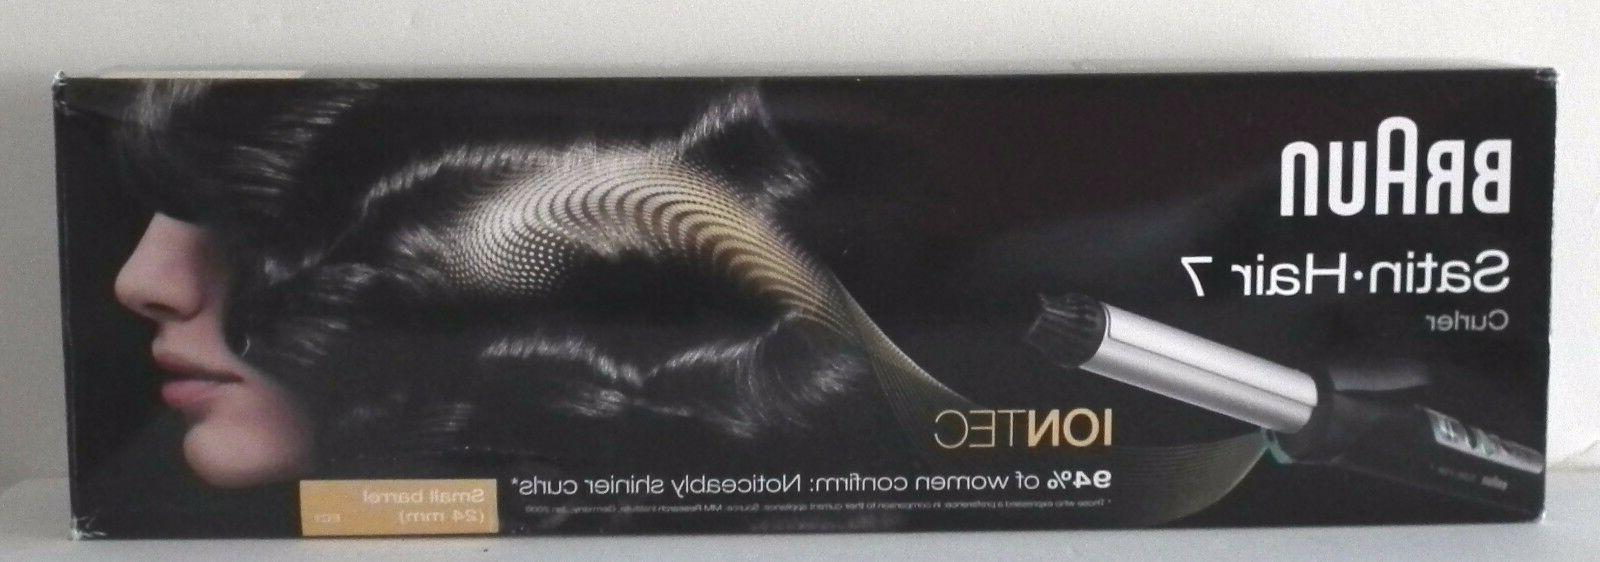 ec1 satin hair 7 curler iontec curling